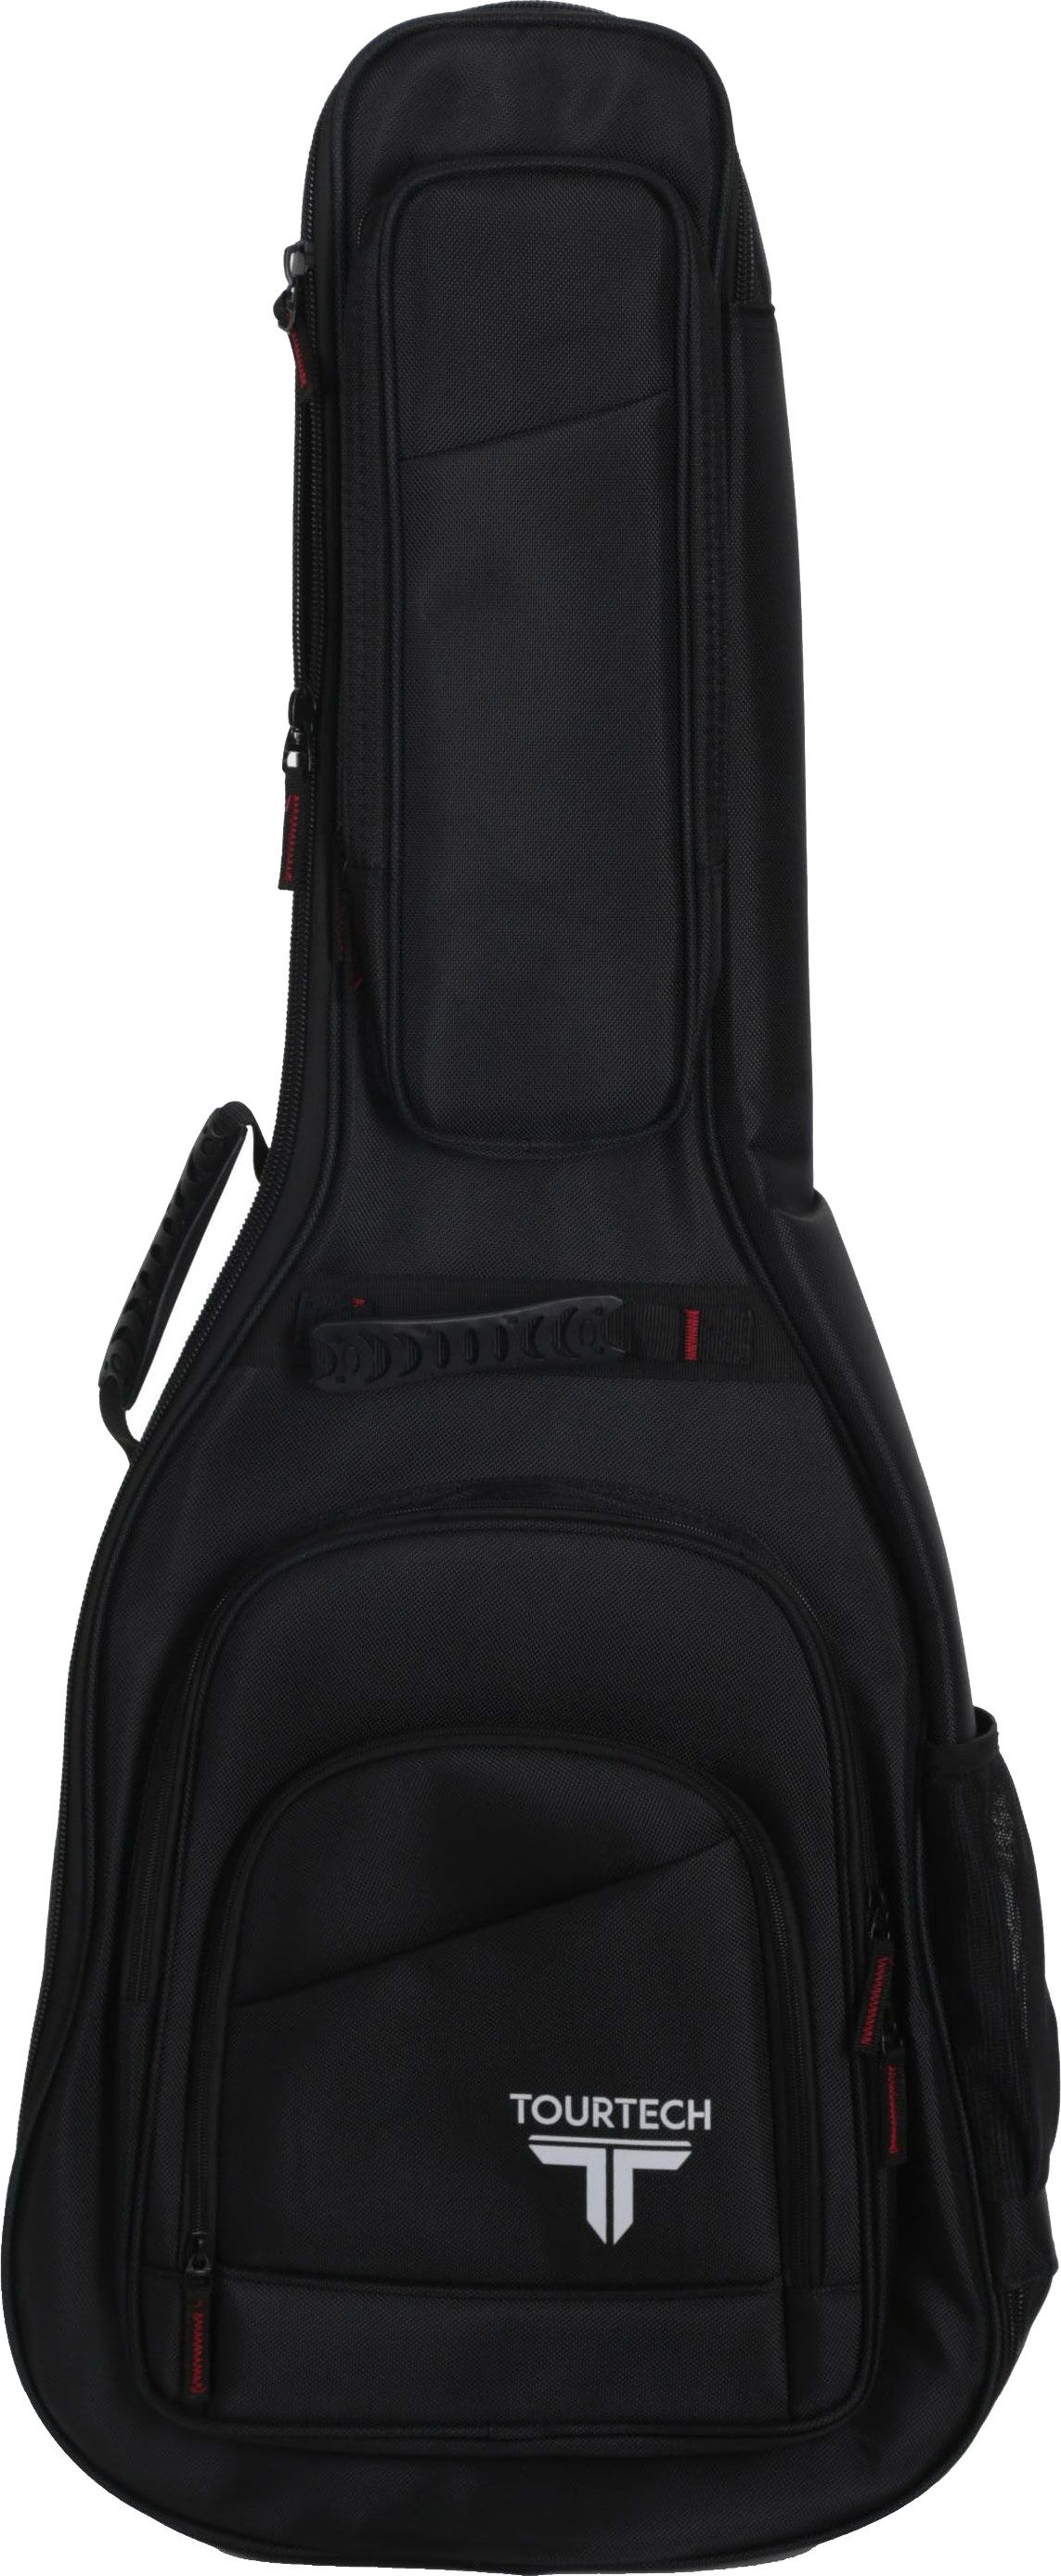 Tourtech Pro Western Acoustic Guitar Gig Bag Acoustic Guitar Guitar Bag Guitar